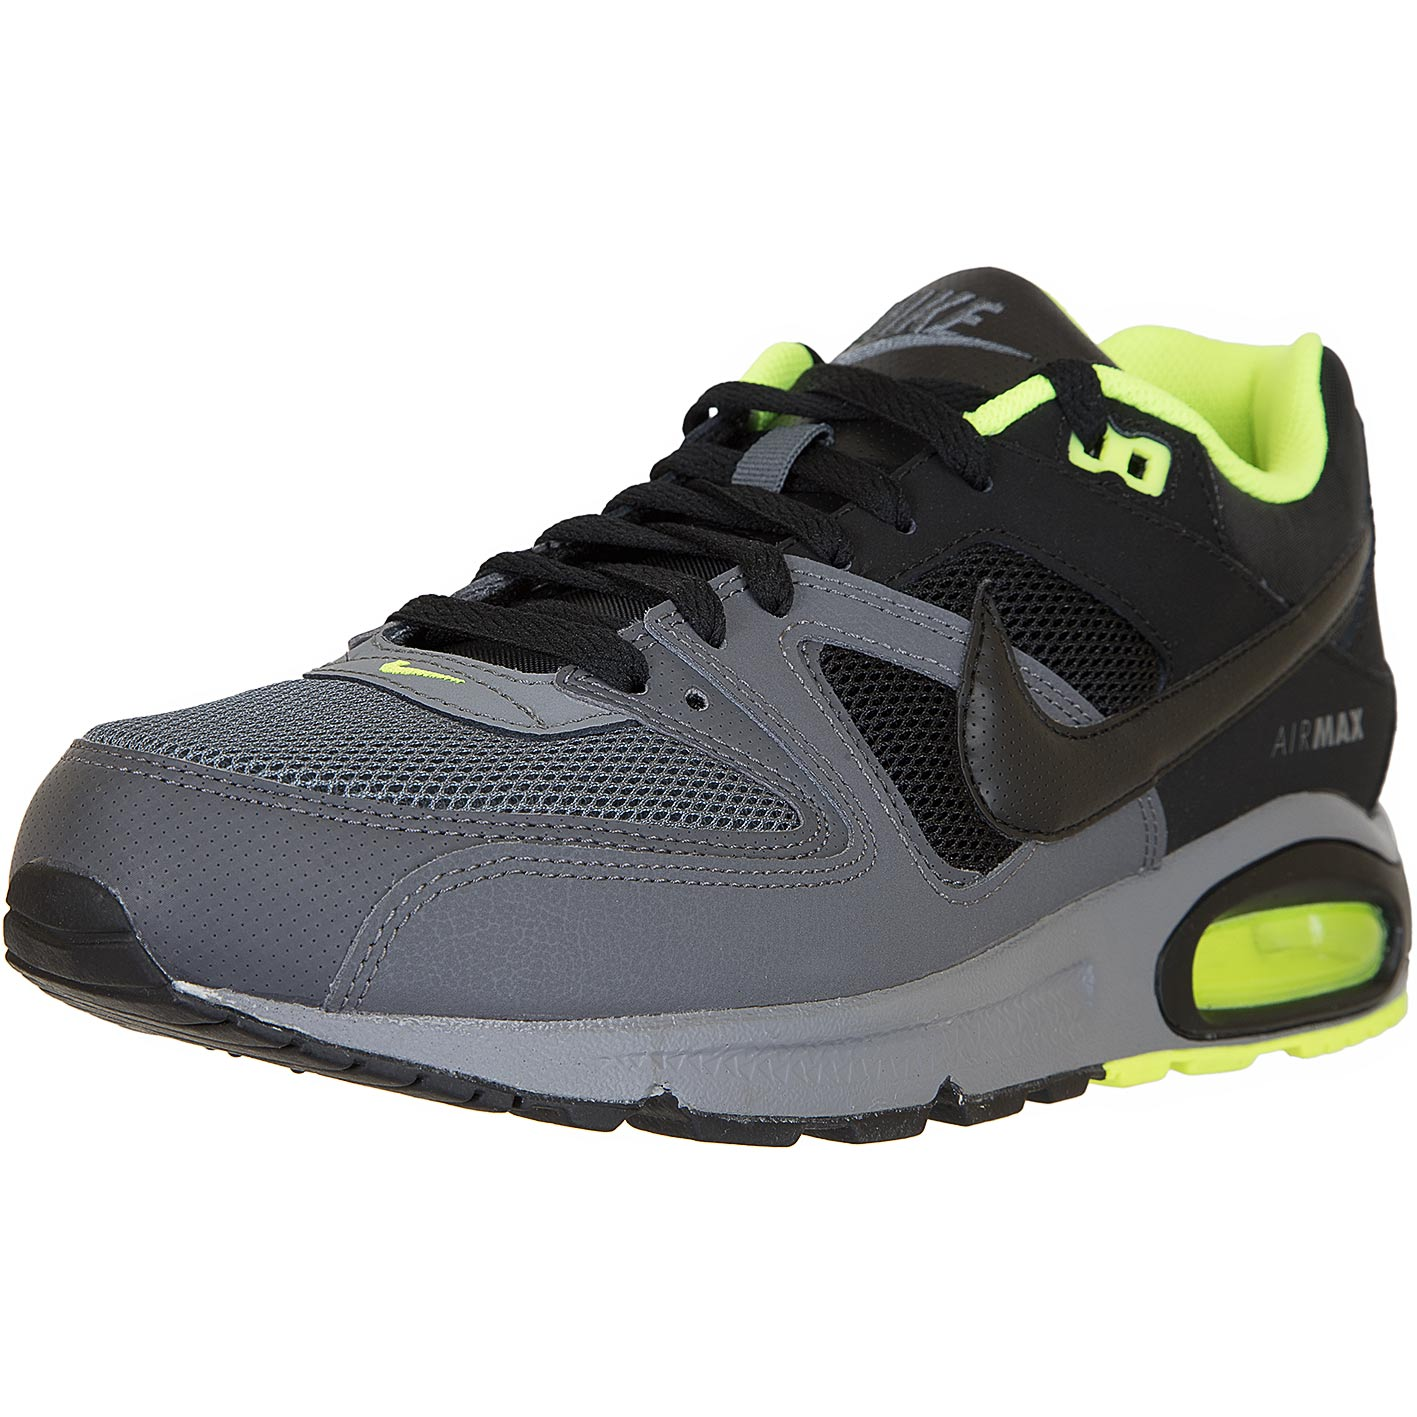 Nike Sportswear Air Max Command Herren Sneaker Blau | Outlet